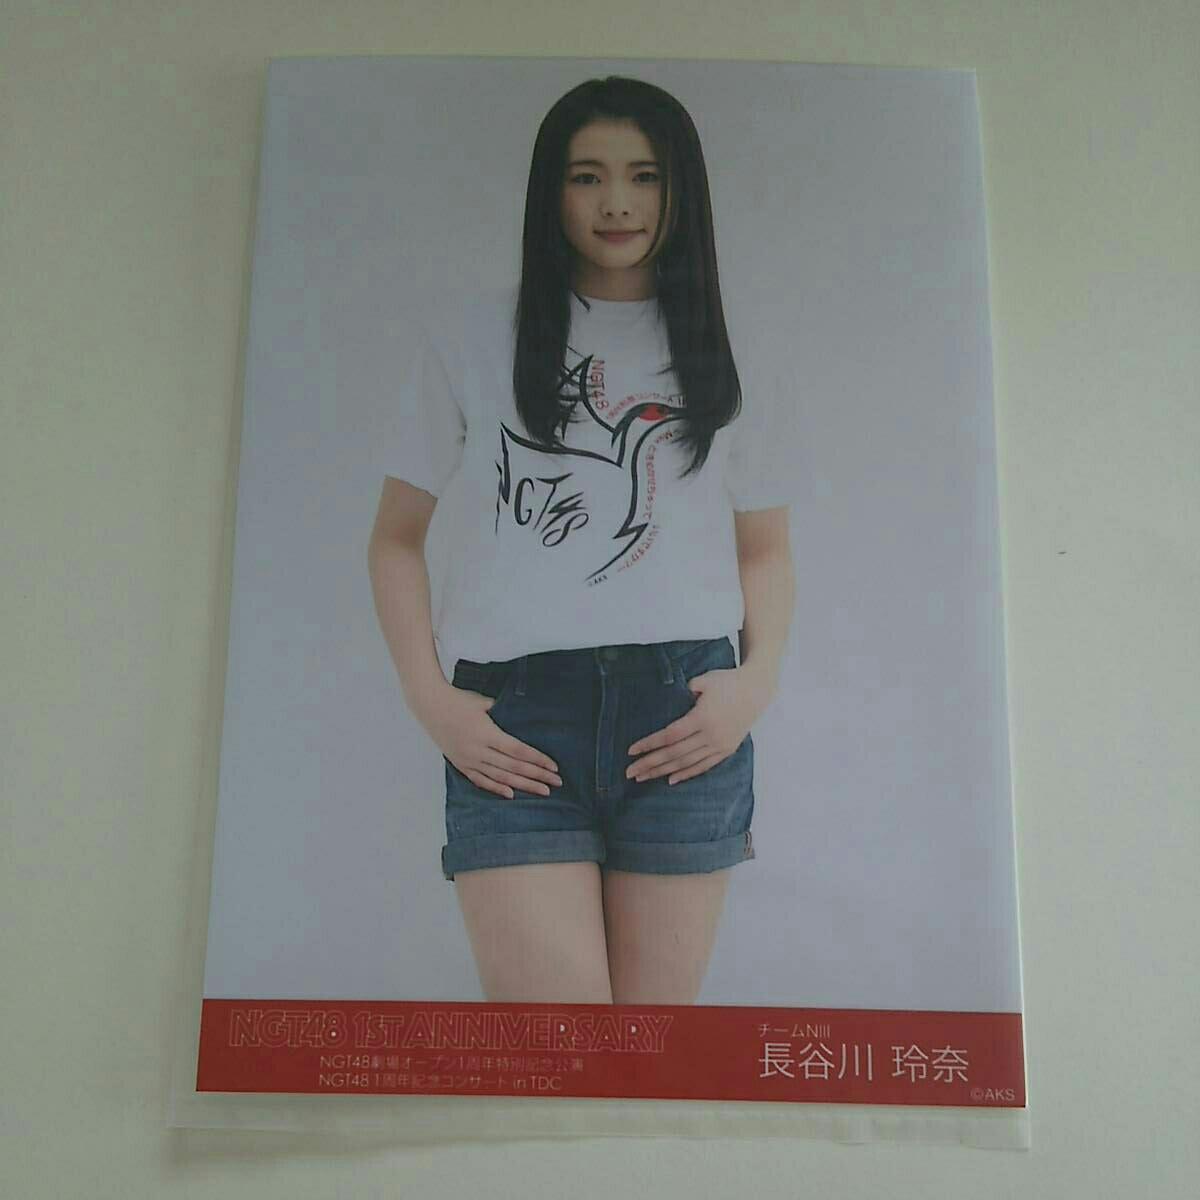 NGT48 長谷川玲奈 1ST ANNIVERSARY DVD/BD 封入 生写真 ライブグッズの画像